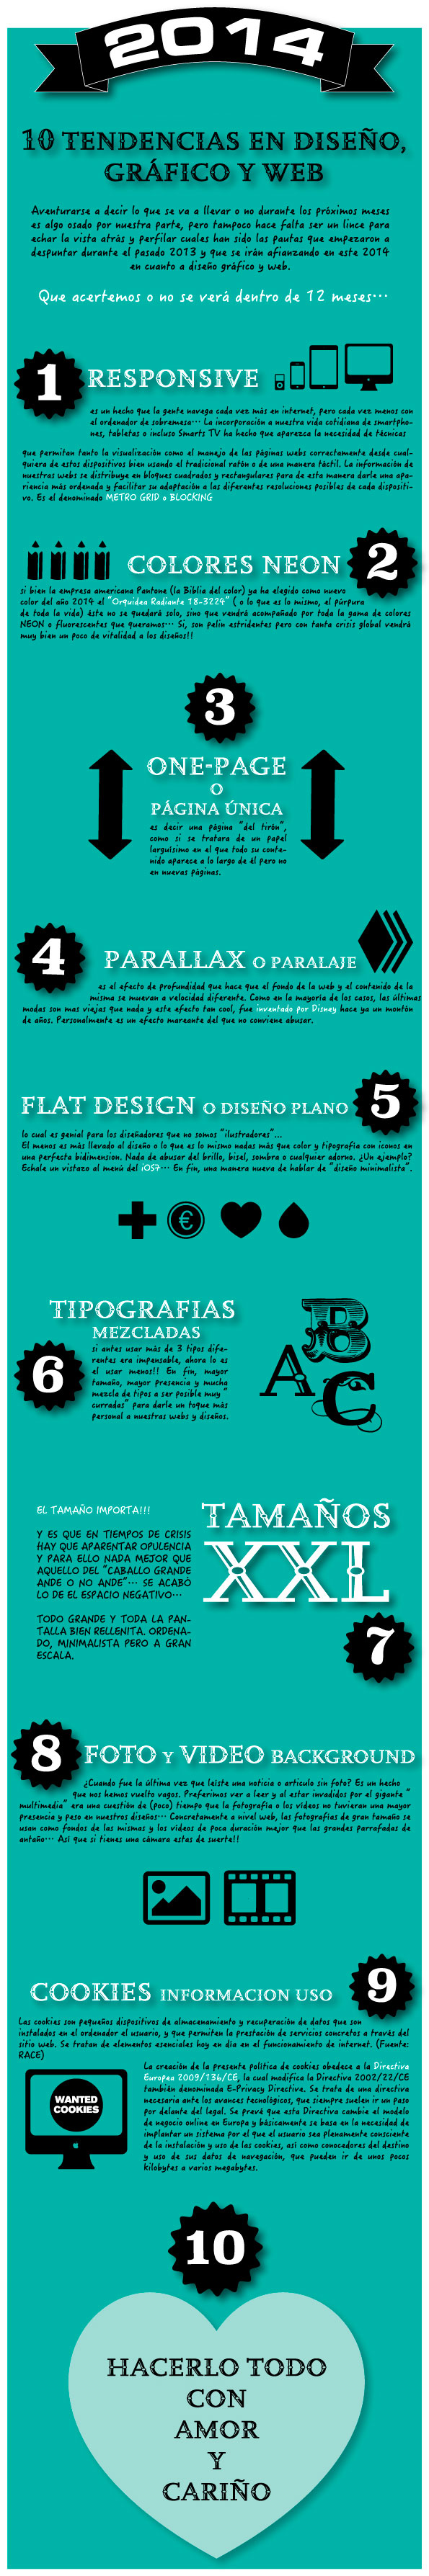 10-tendencias-para-2014